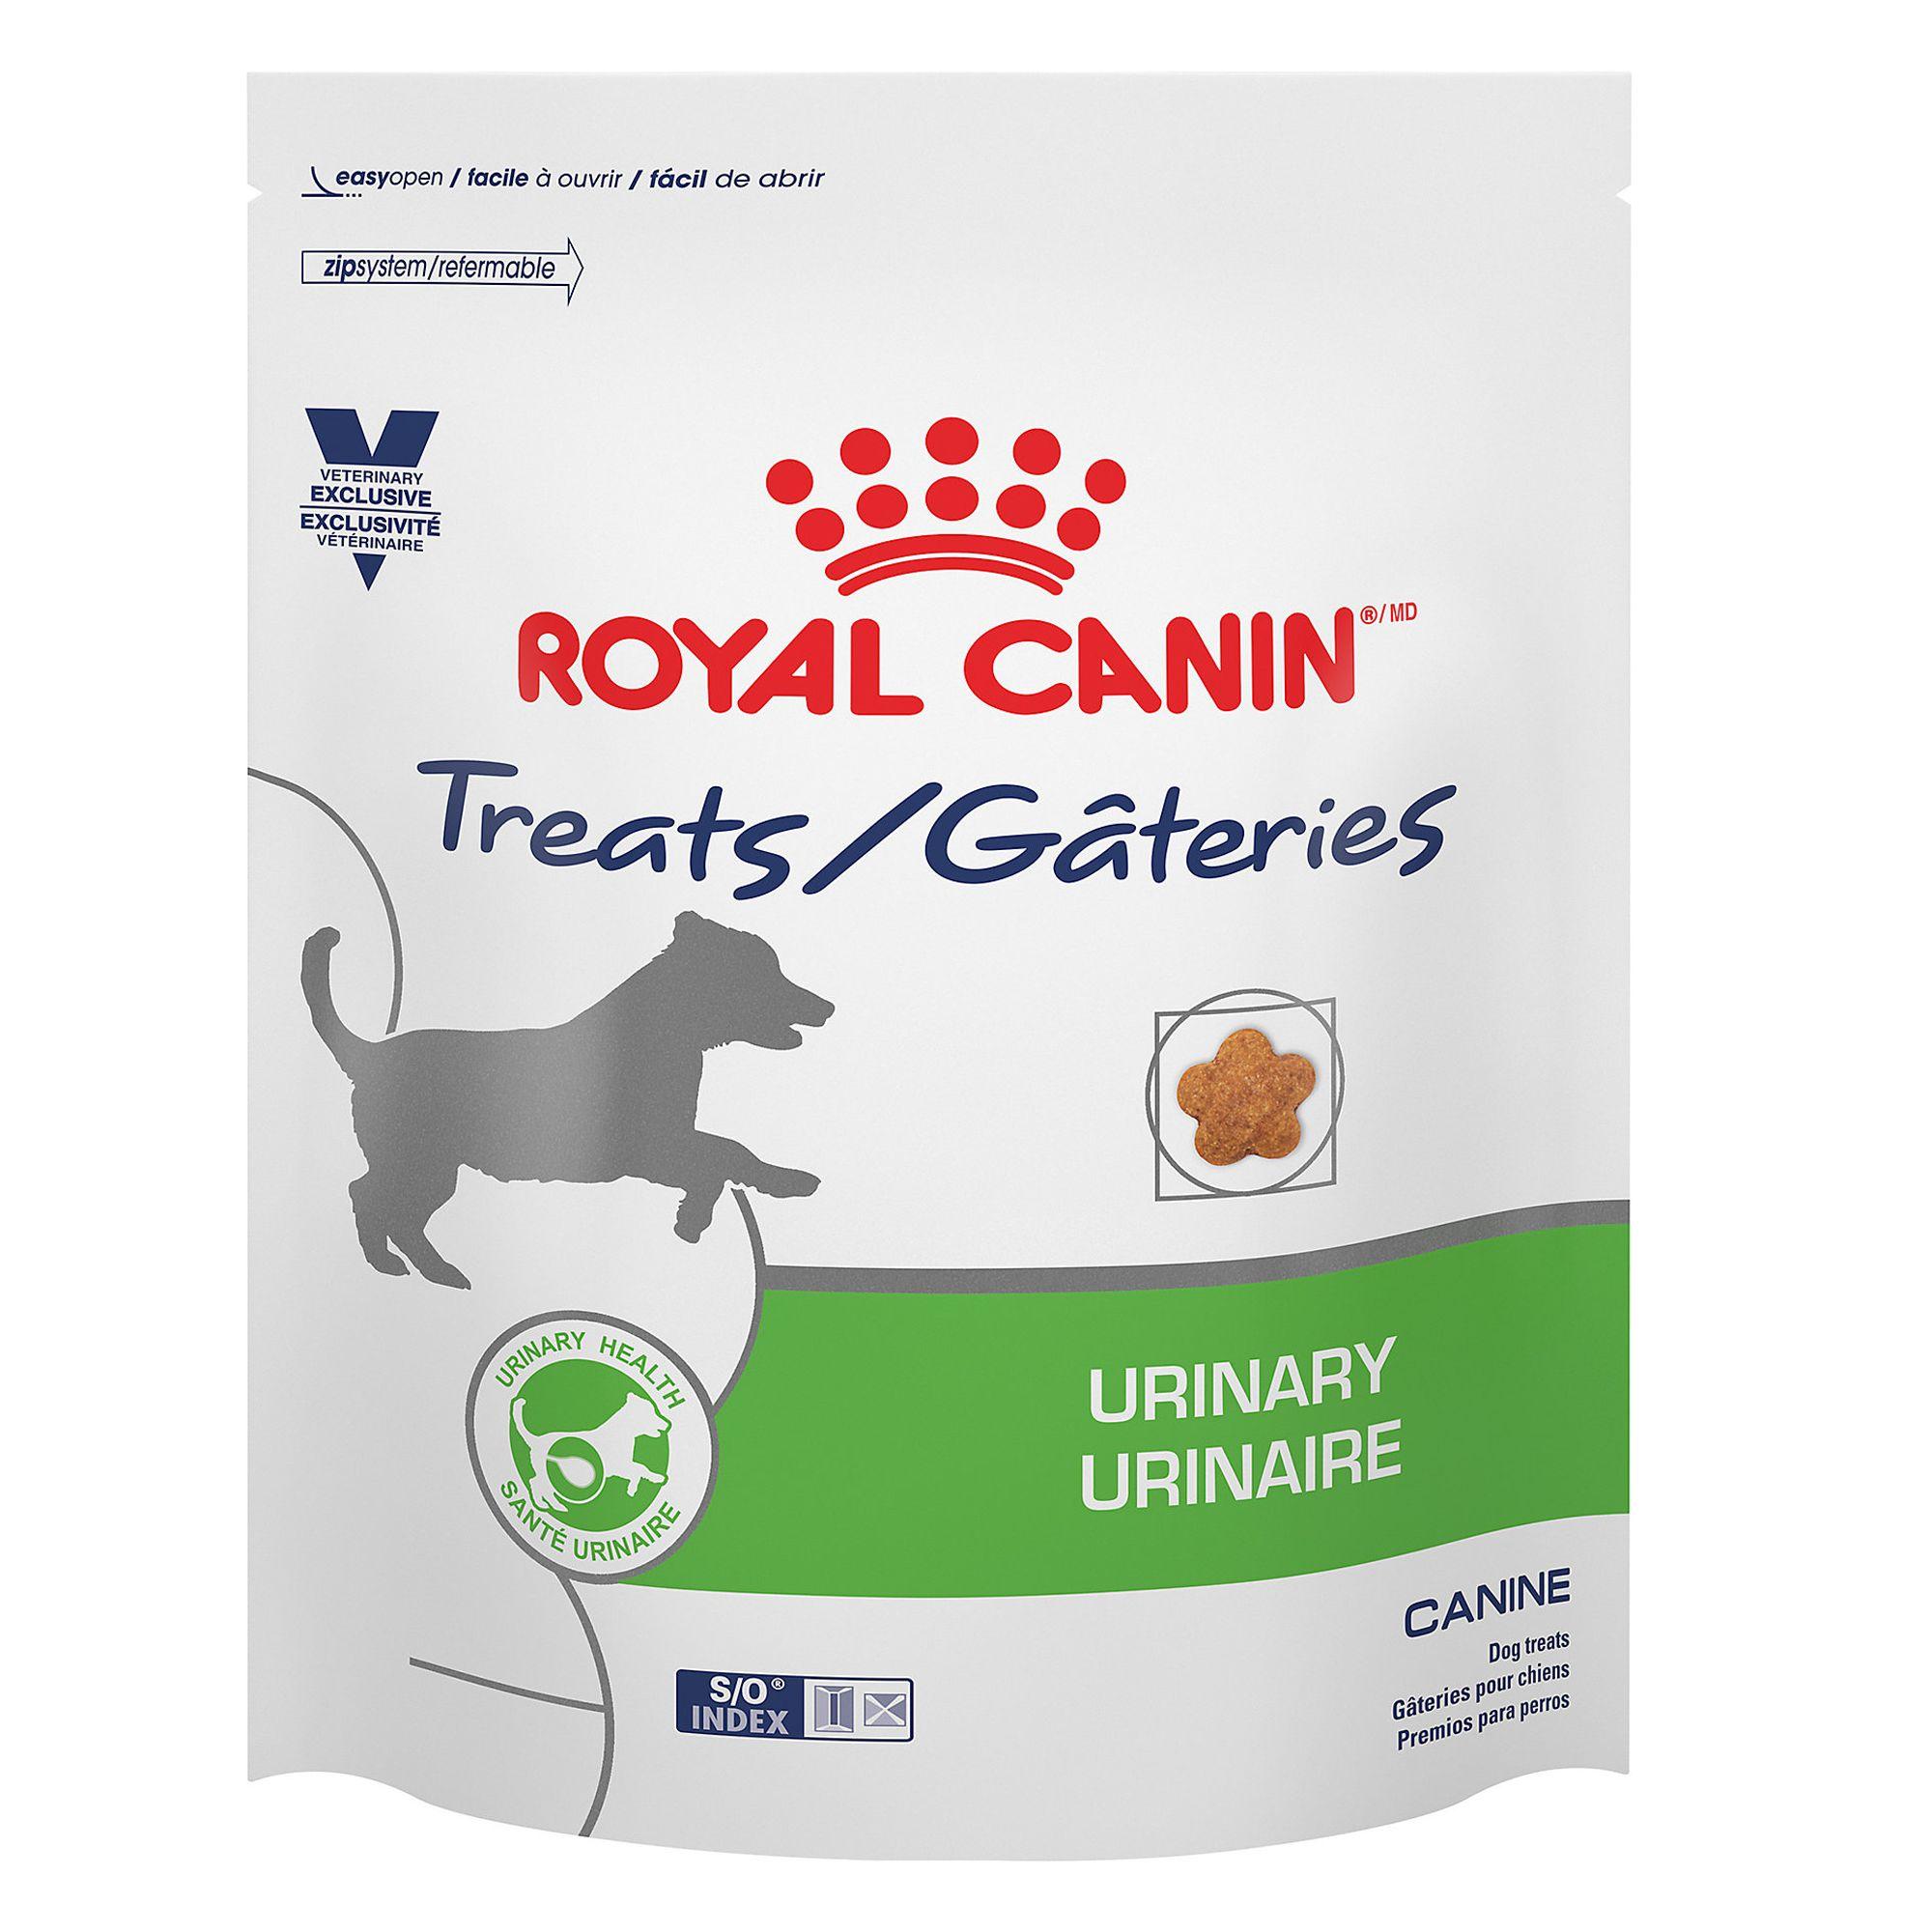 Royal Canin Cat Food Urinary Care